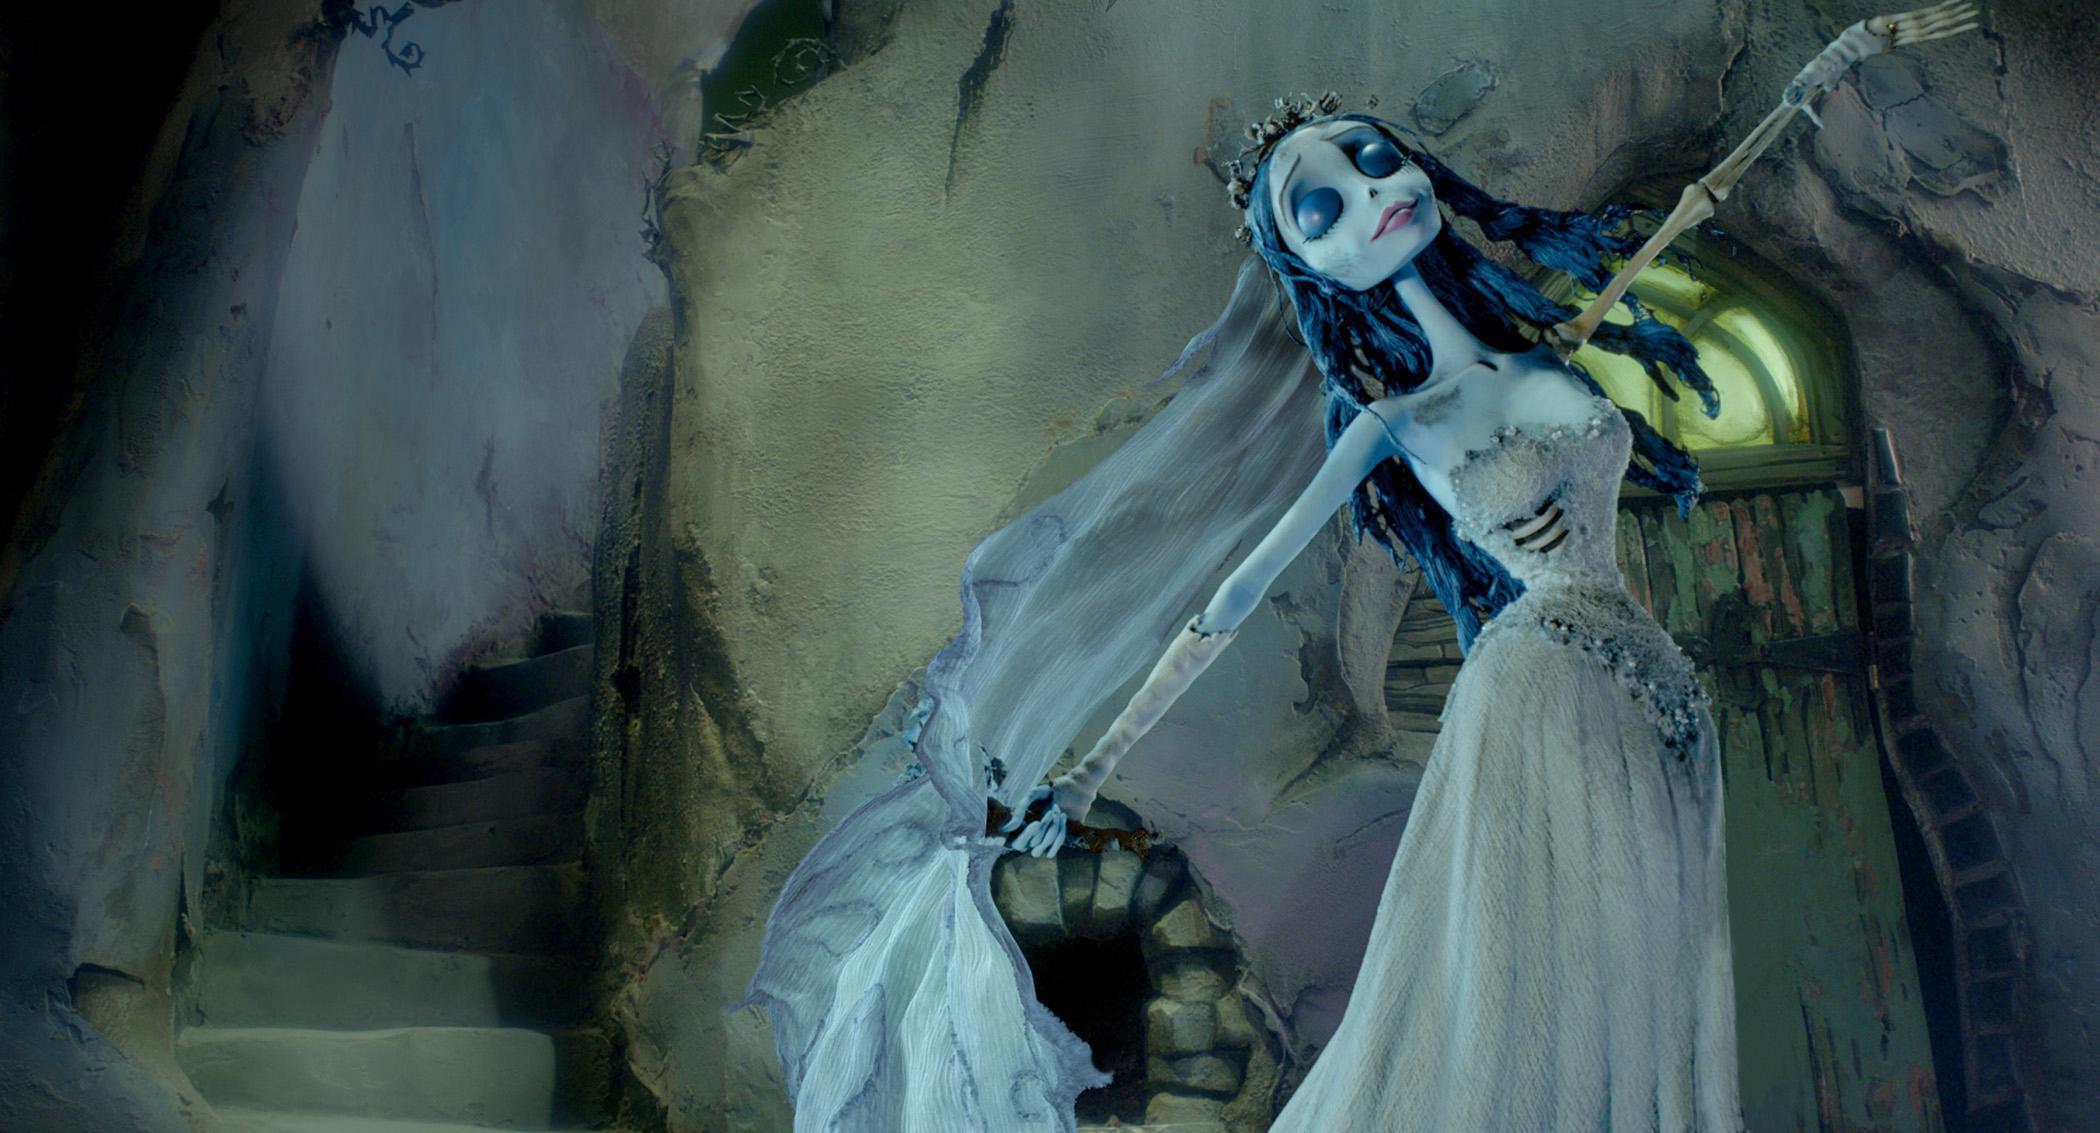 Corpse Bride Wedding Gown: Corpse Bride Wallpapers